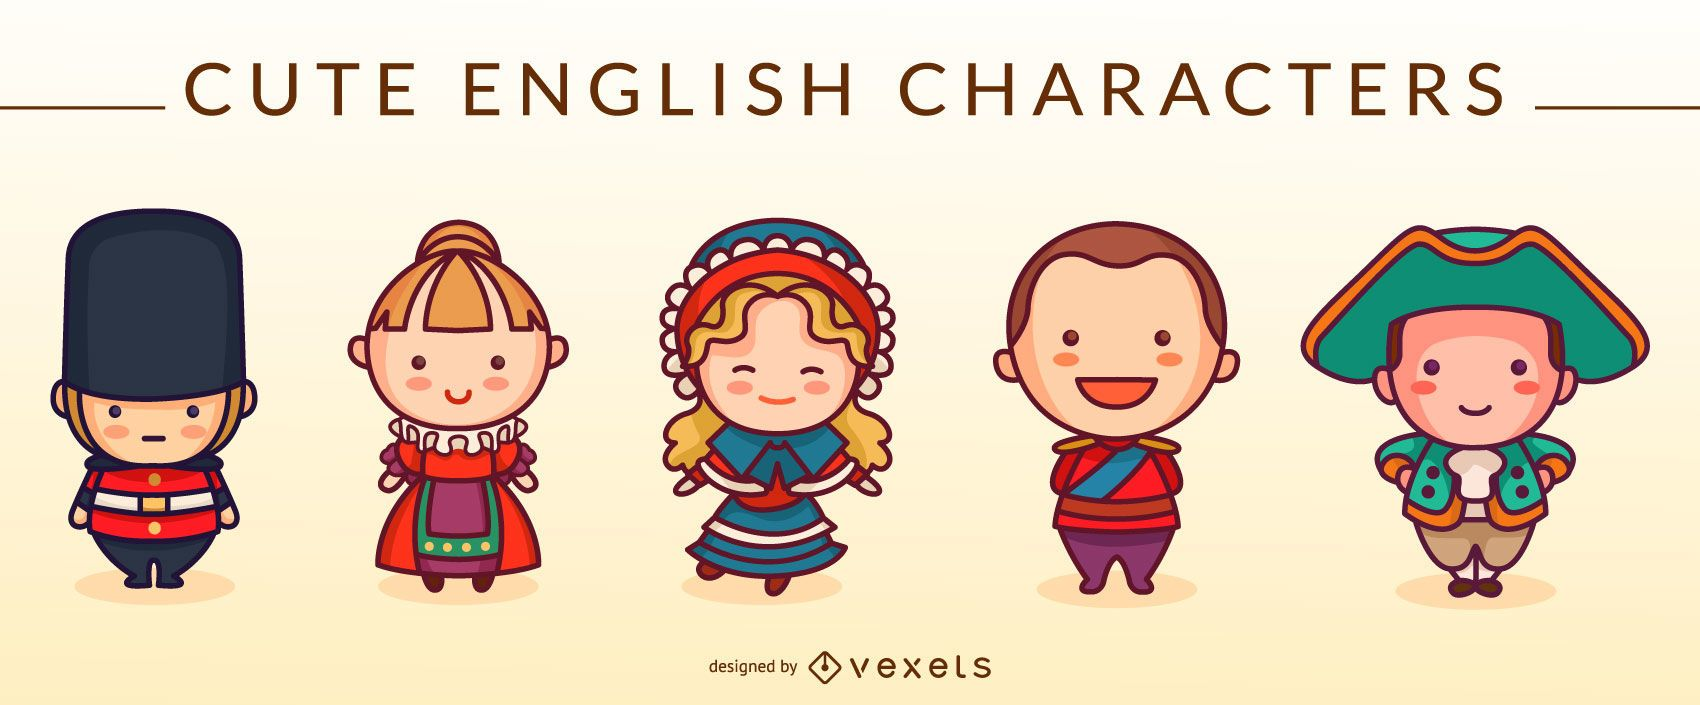 Cute english characters set